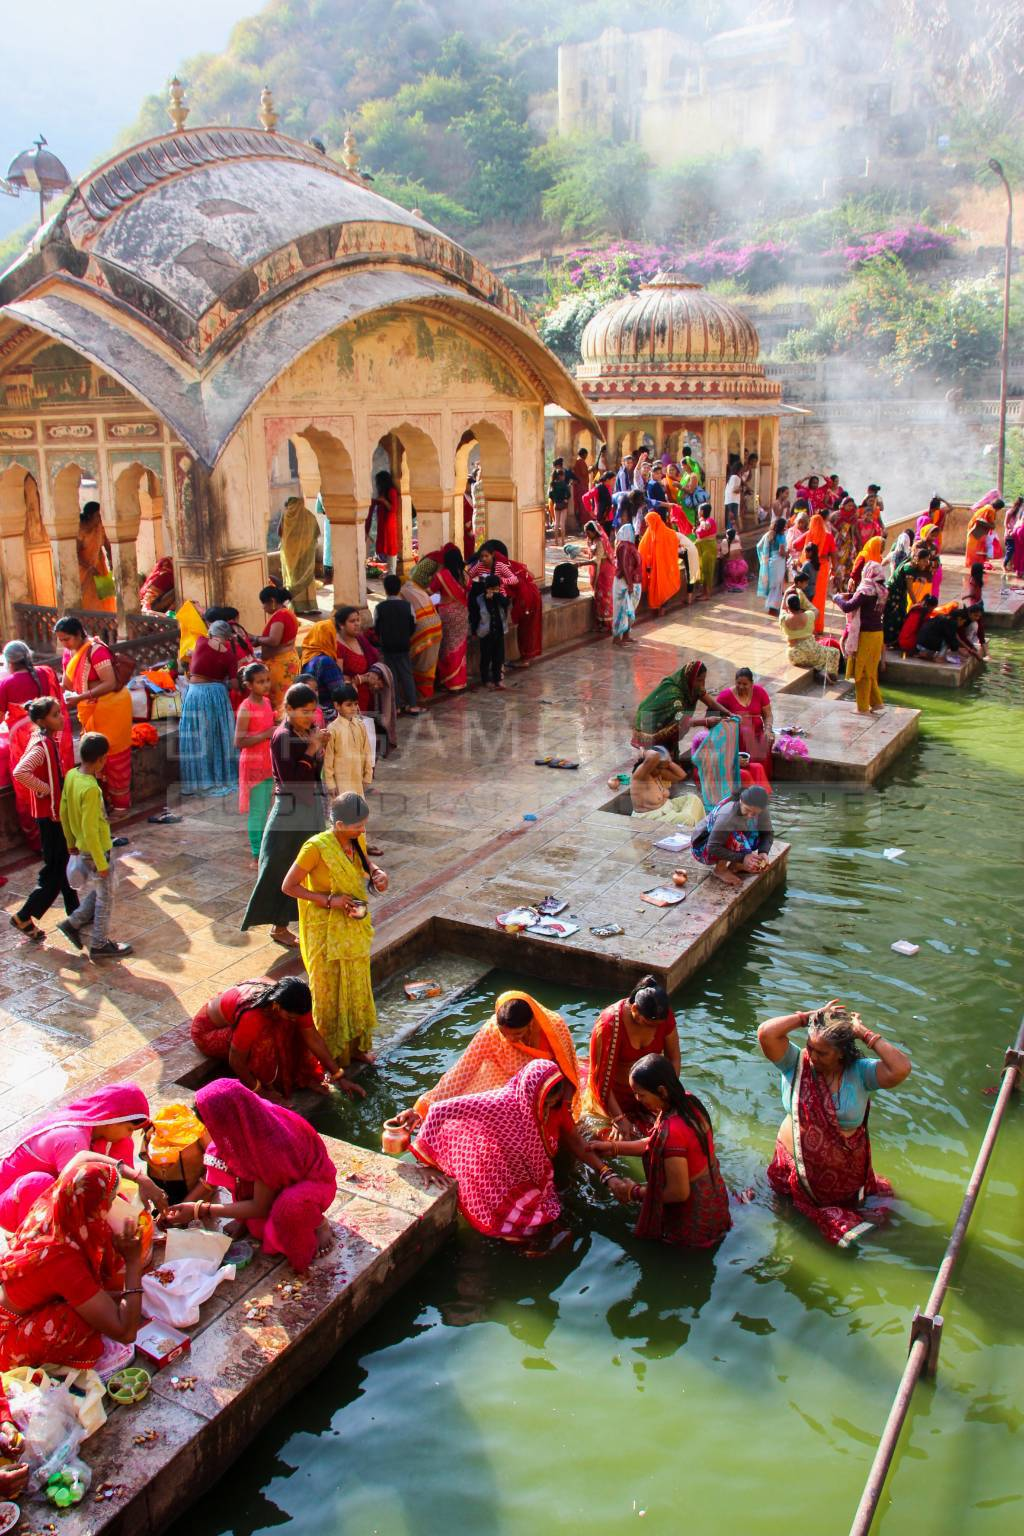 Dieci cose da sapere per chi va in India